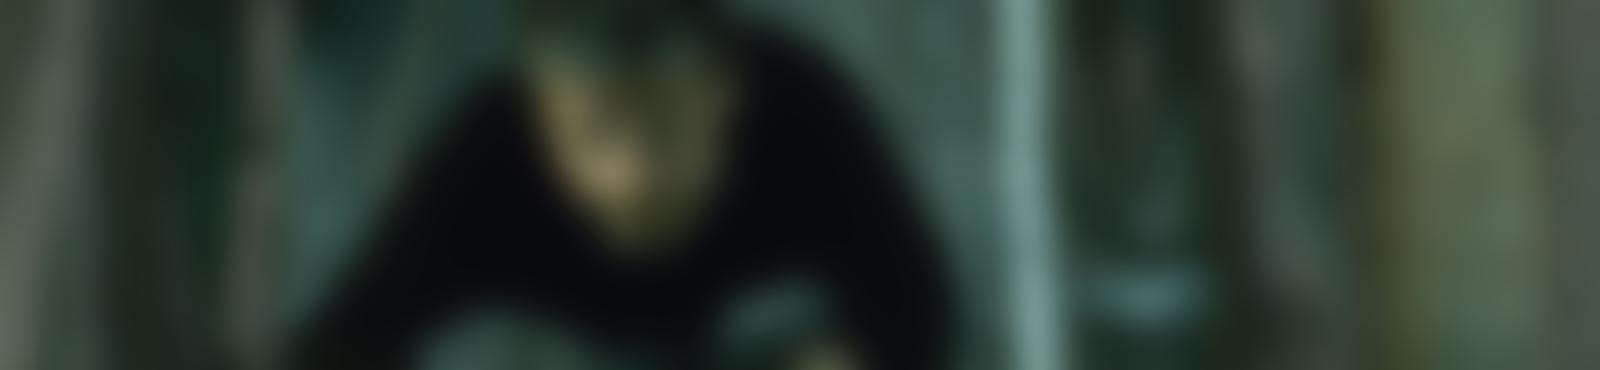 Blurred e73e4b4c b100 4f52 8530 f3080db3caba